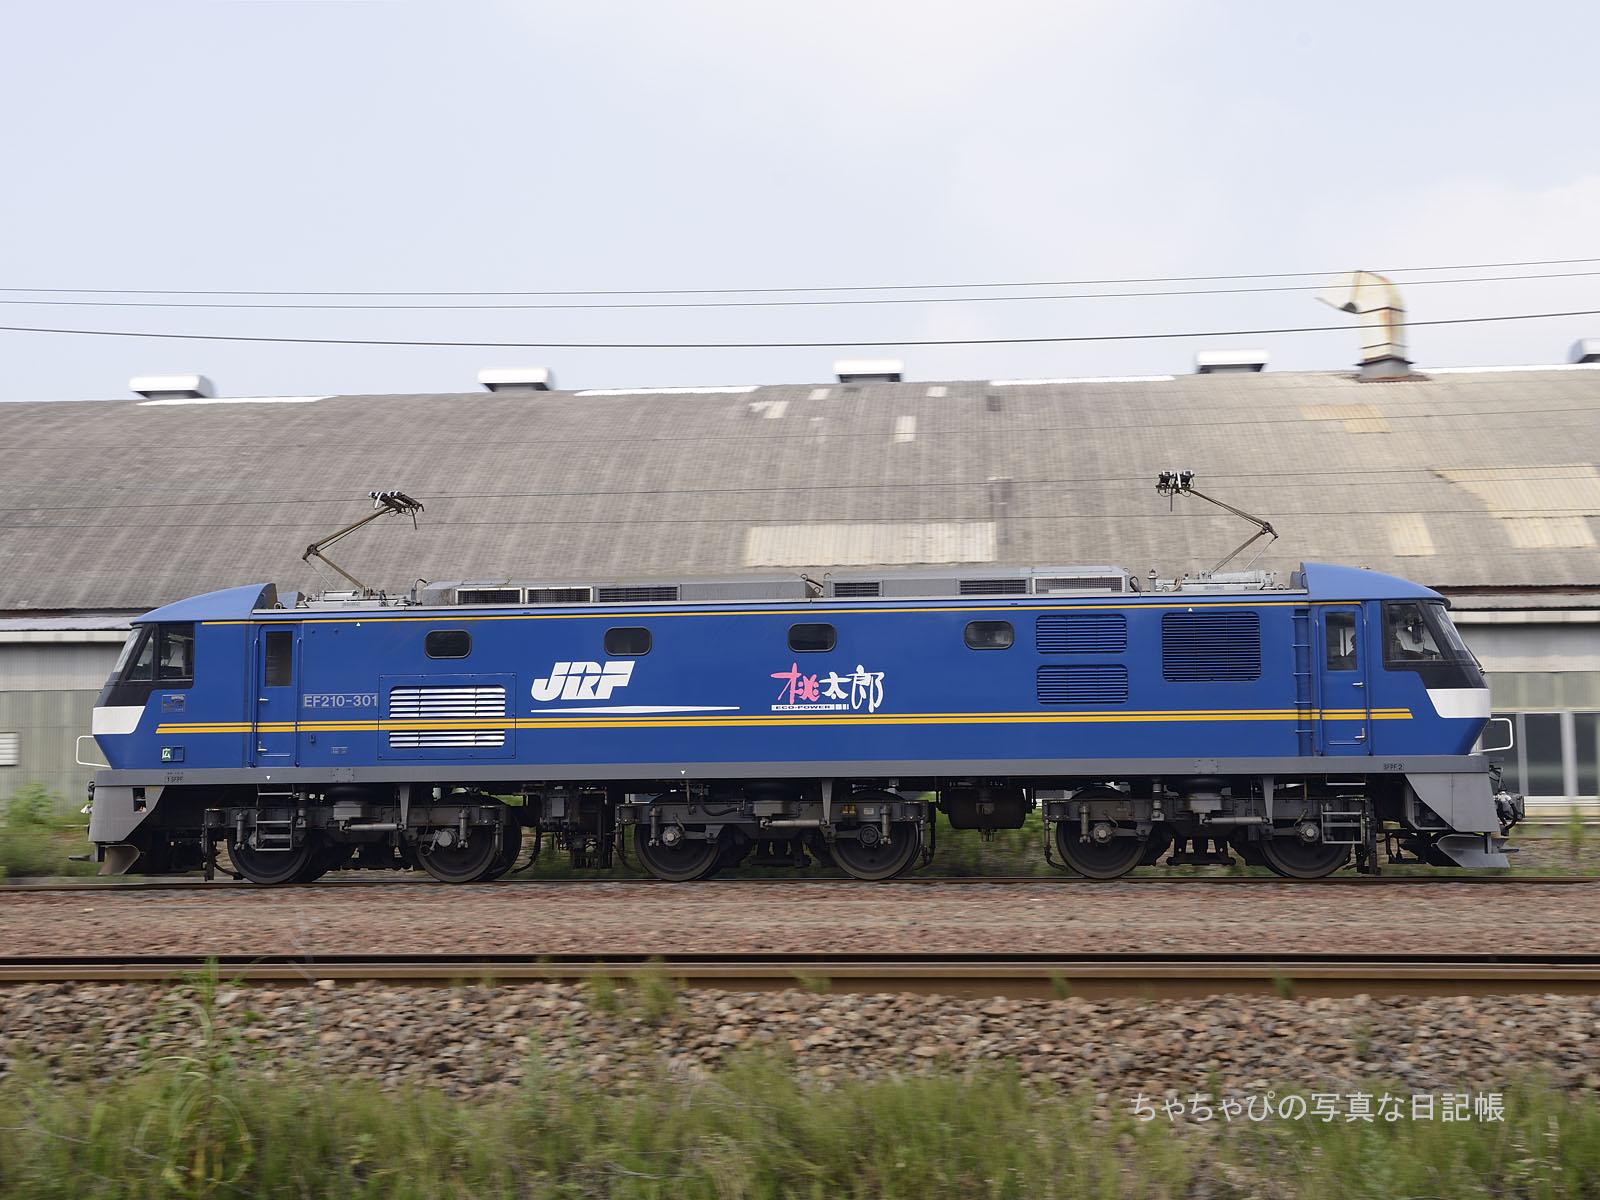 単587レ、EF210-301 向洋駅~天神川駅